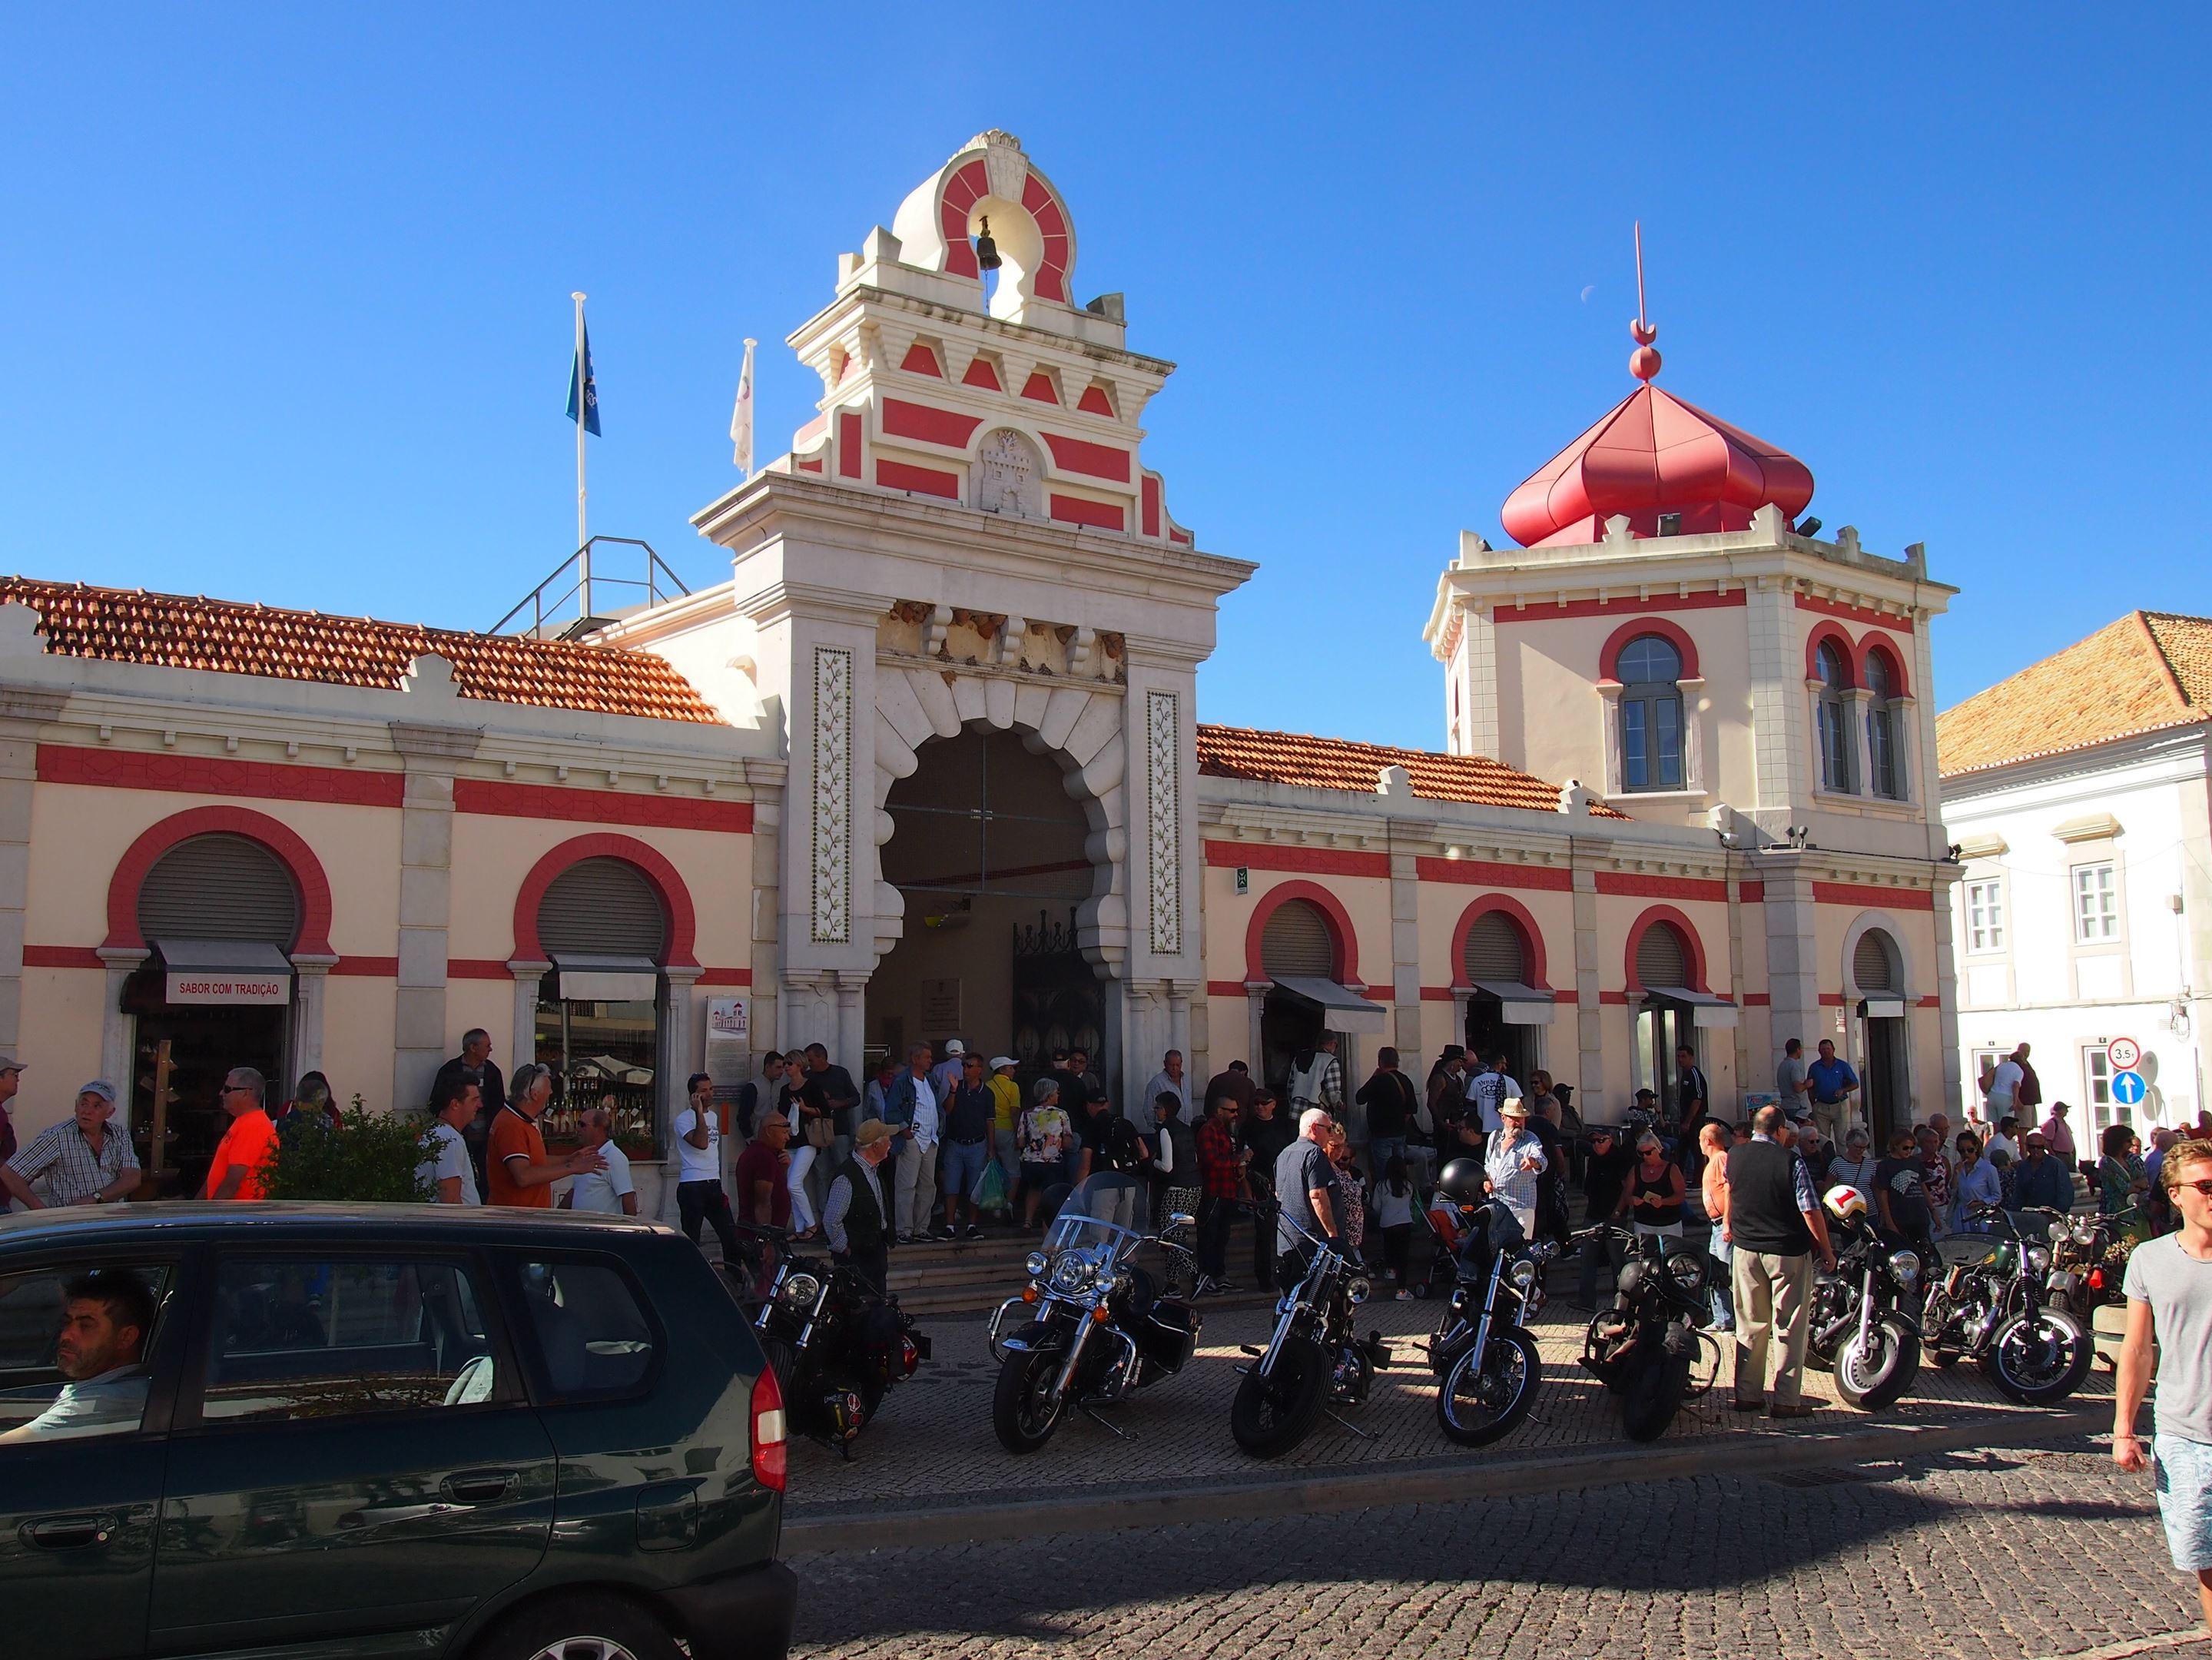 Mercado Municipal de Loulé (Loulé Market), Algarve - Harley Davidson meeting